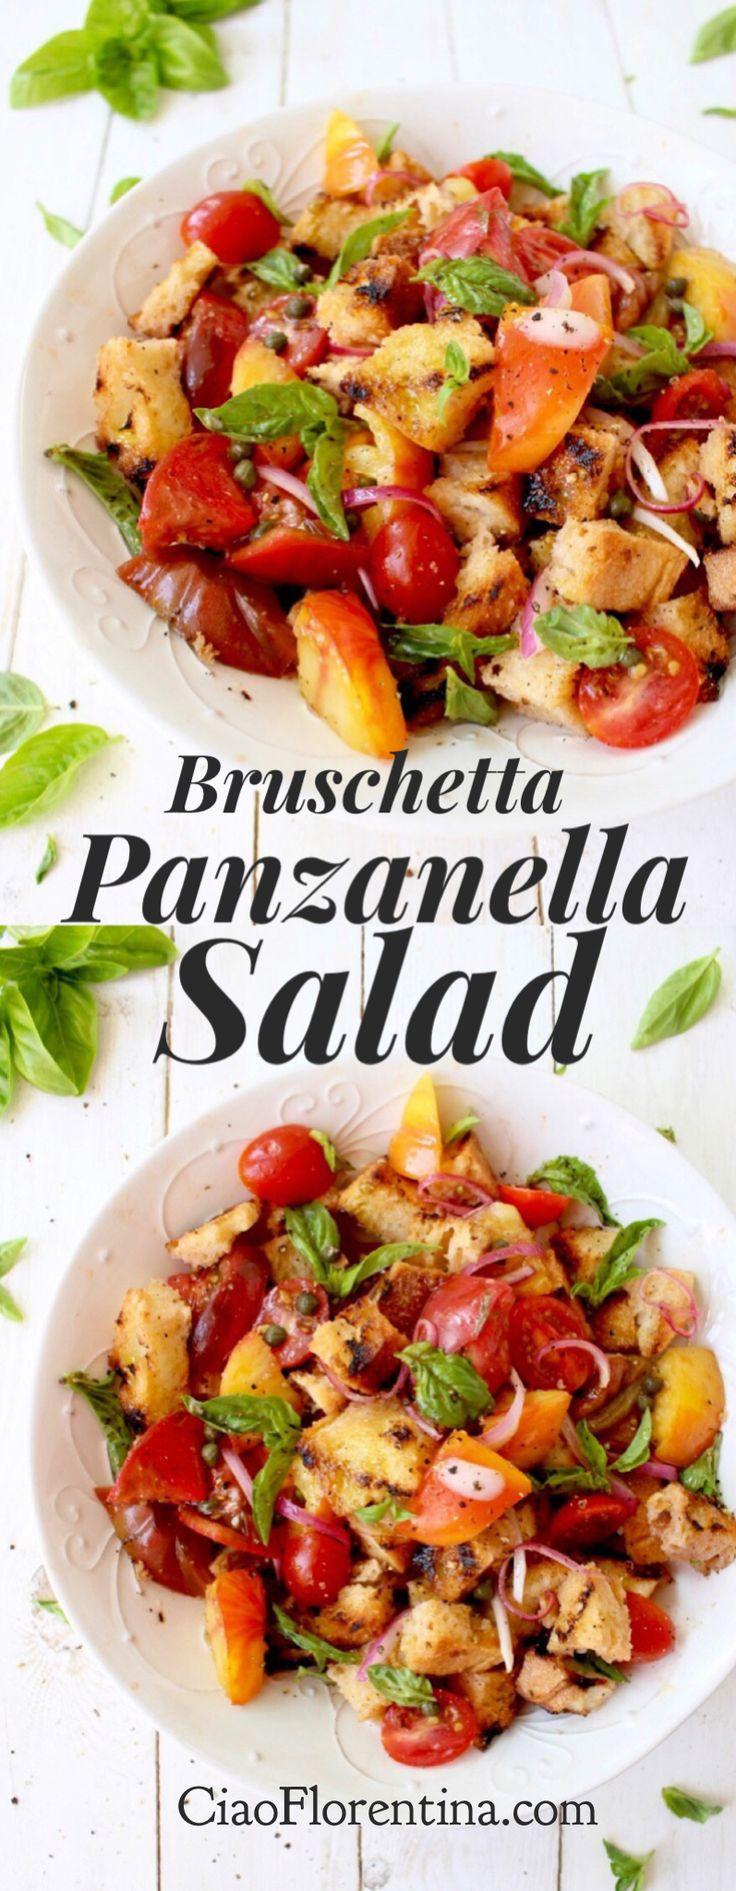 Grilled Bruschetta Panzanella Salad Recipe   CiaoFlorentina.com @CiaoFlorentina